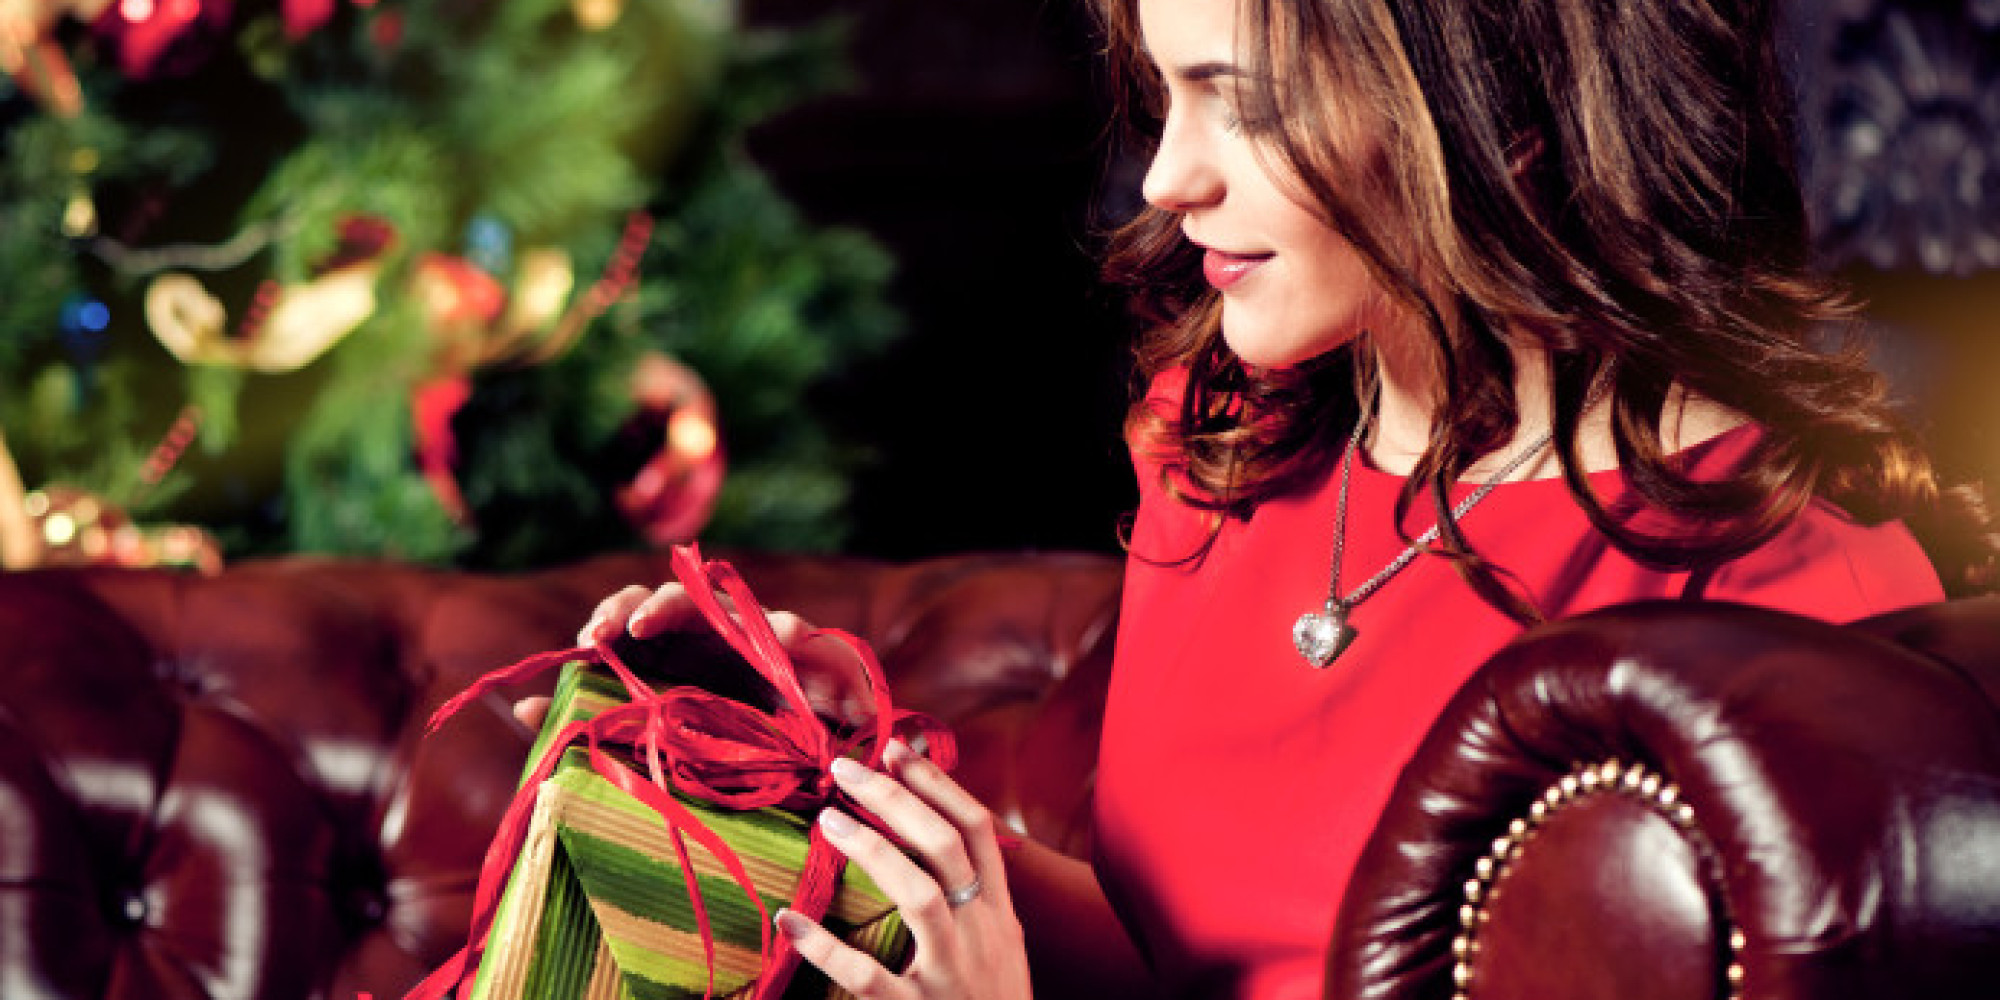 women red dress luxury present